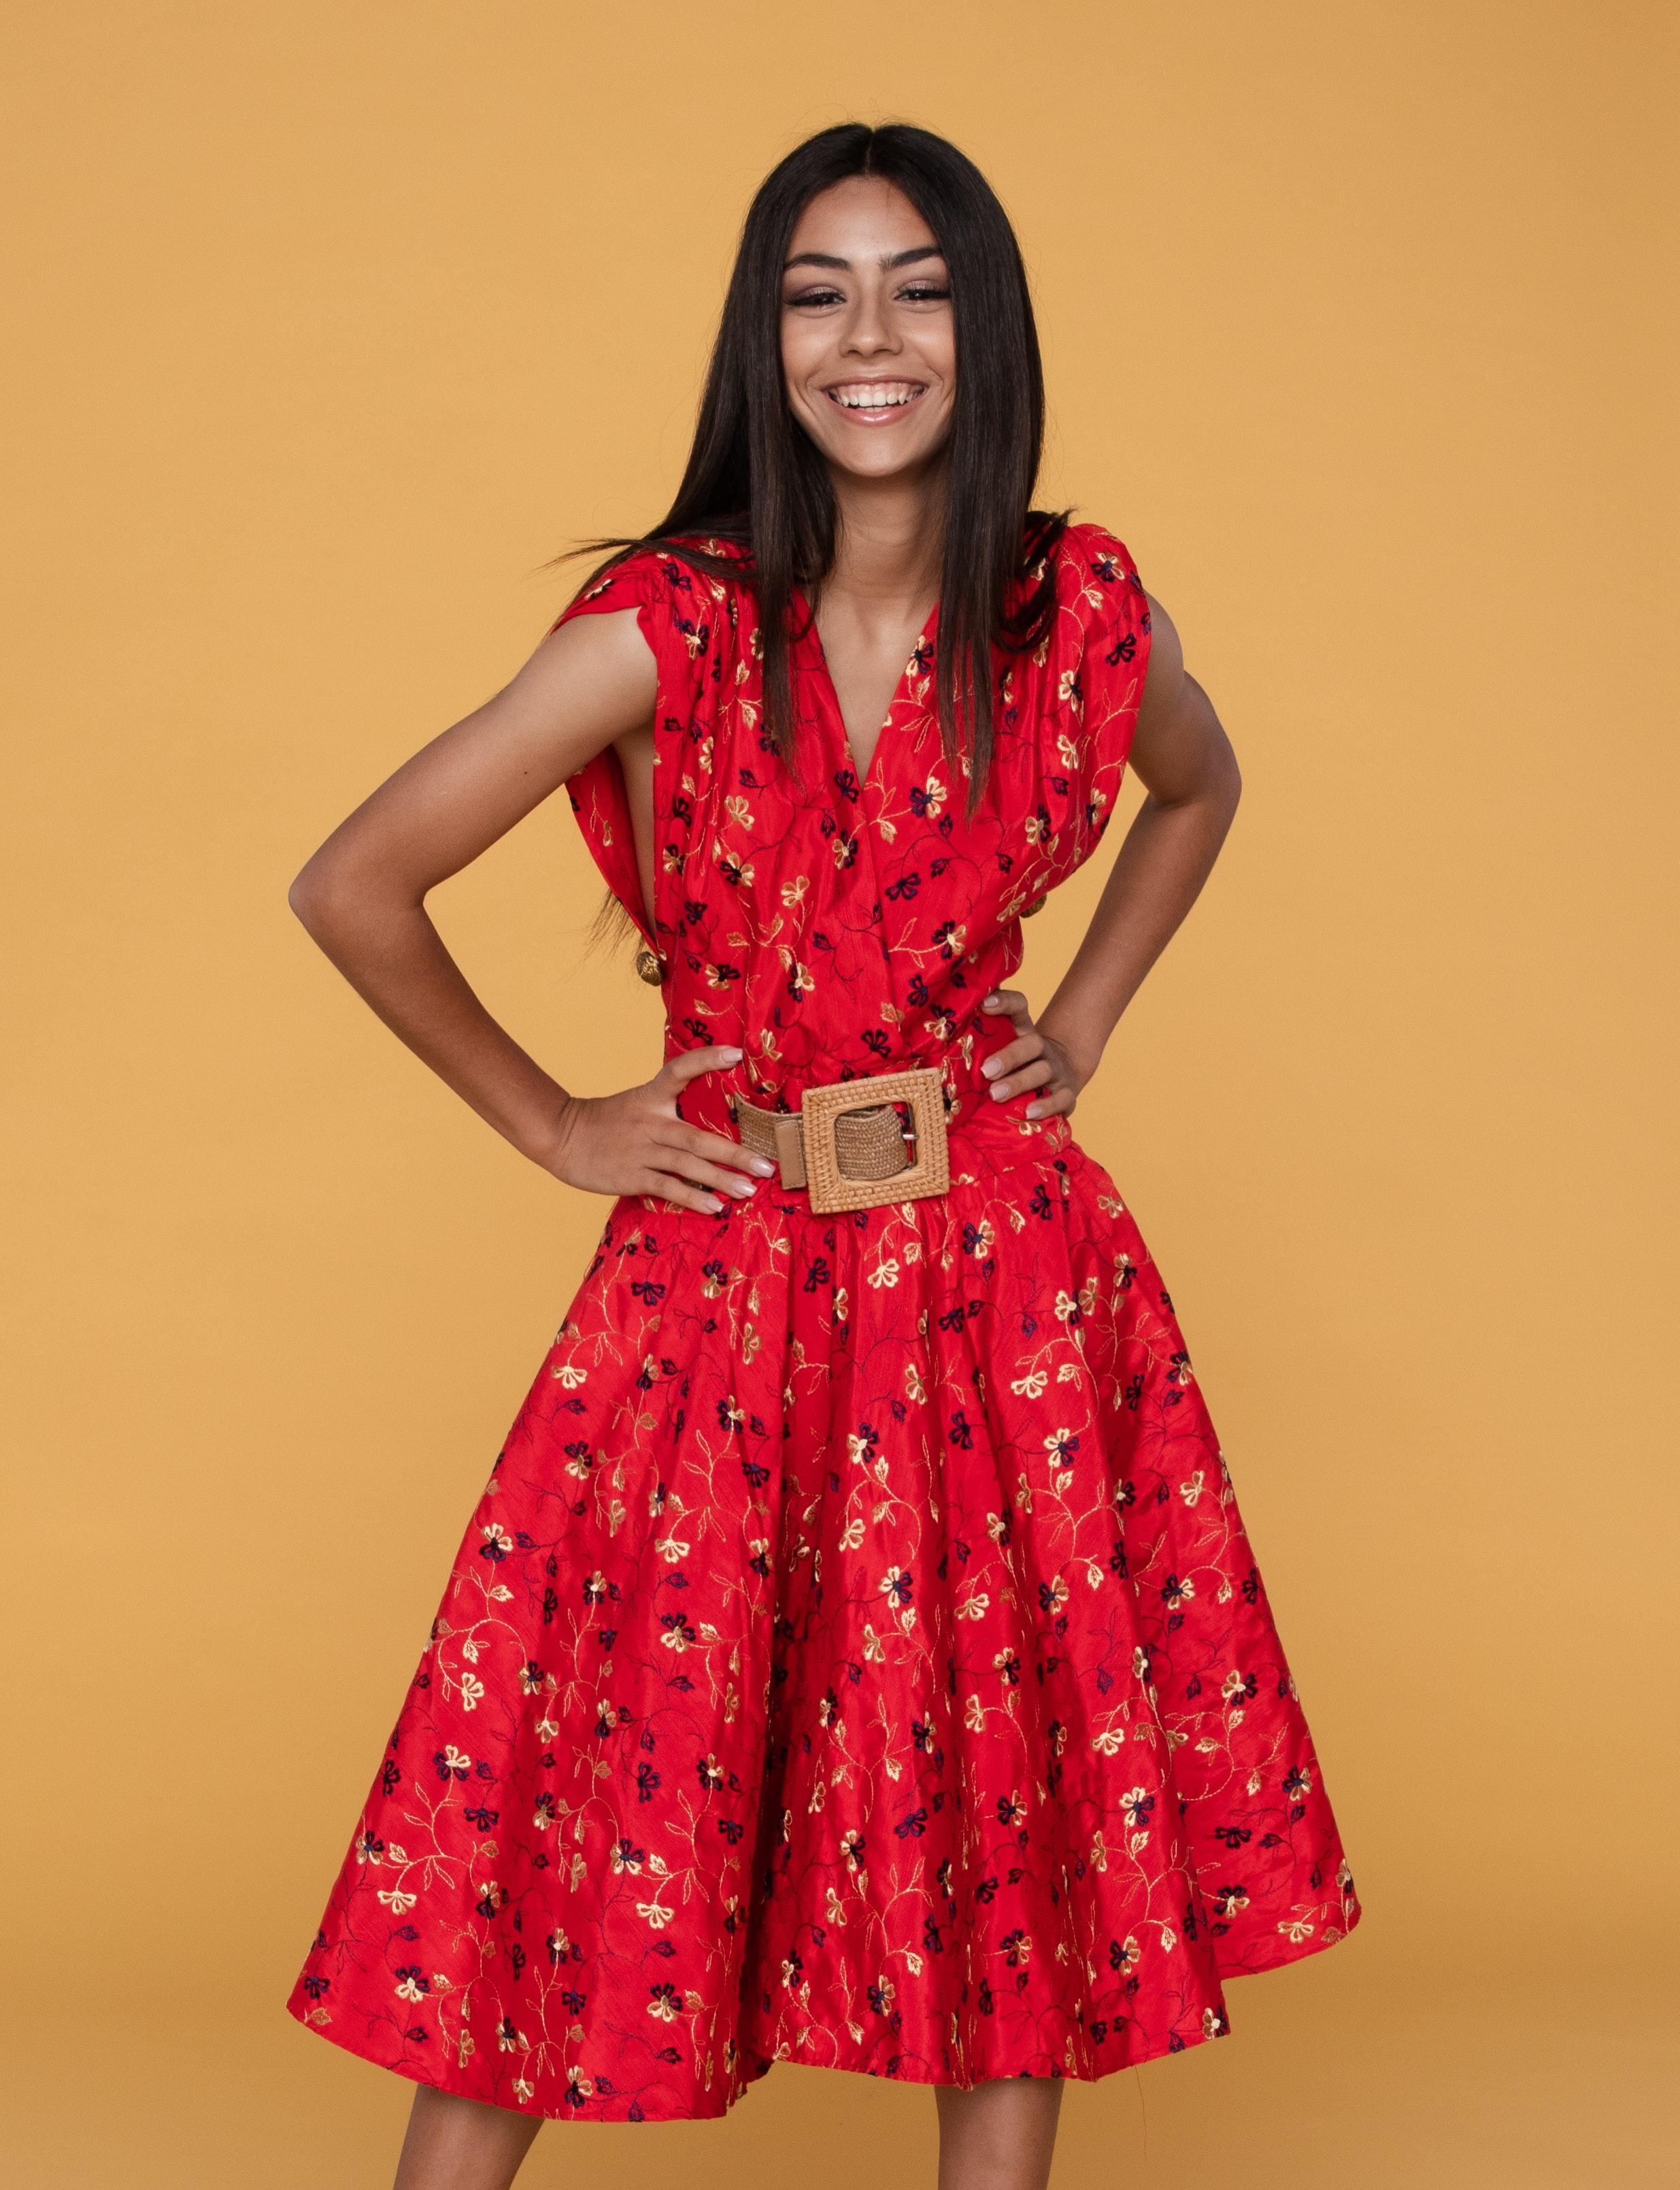 MakersValley Blog | dress designs | browse samples